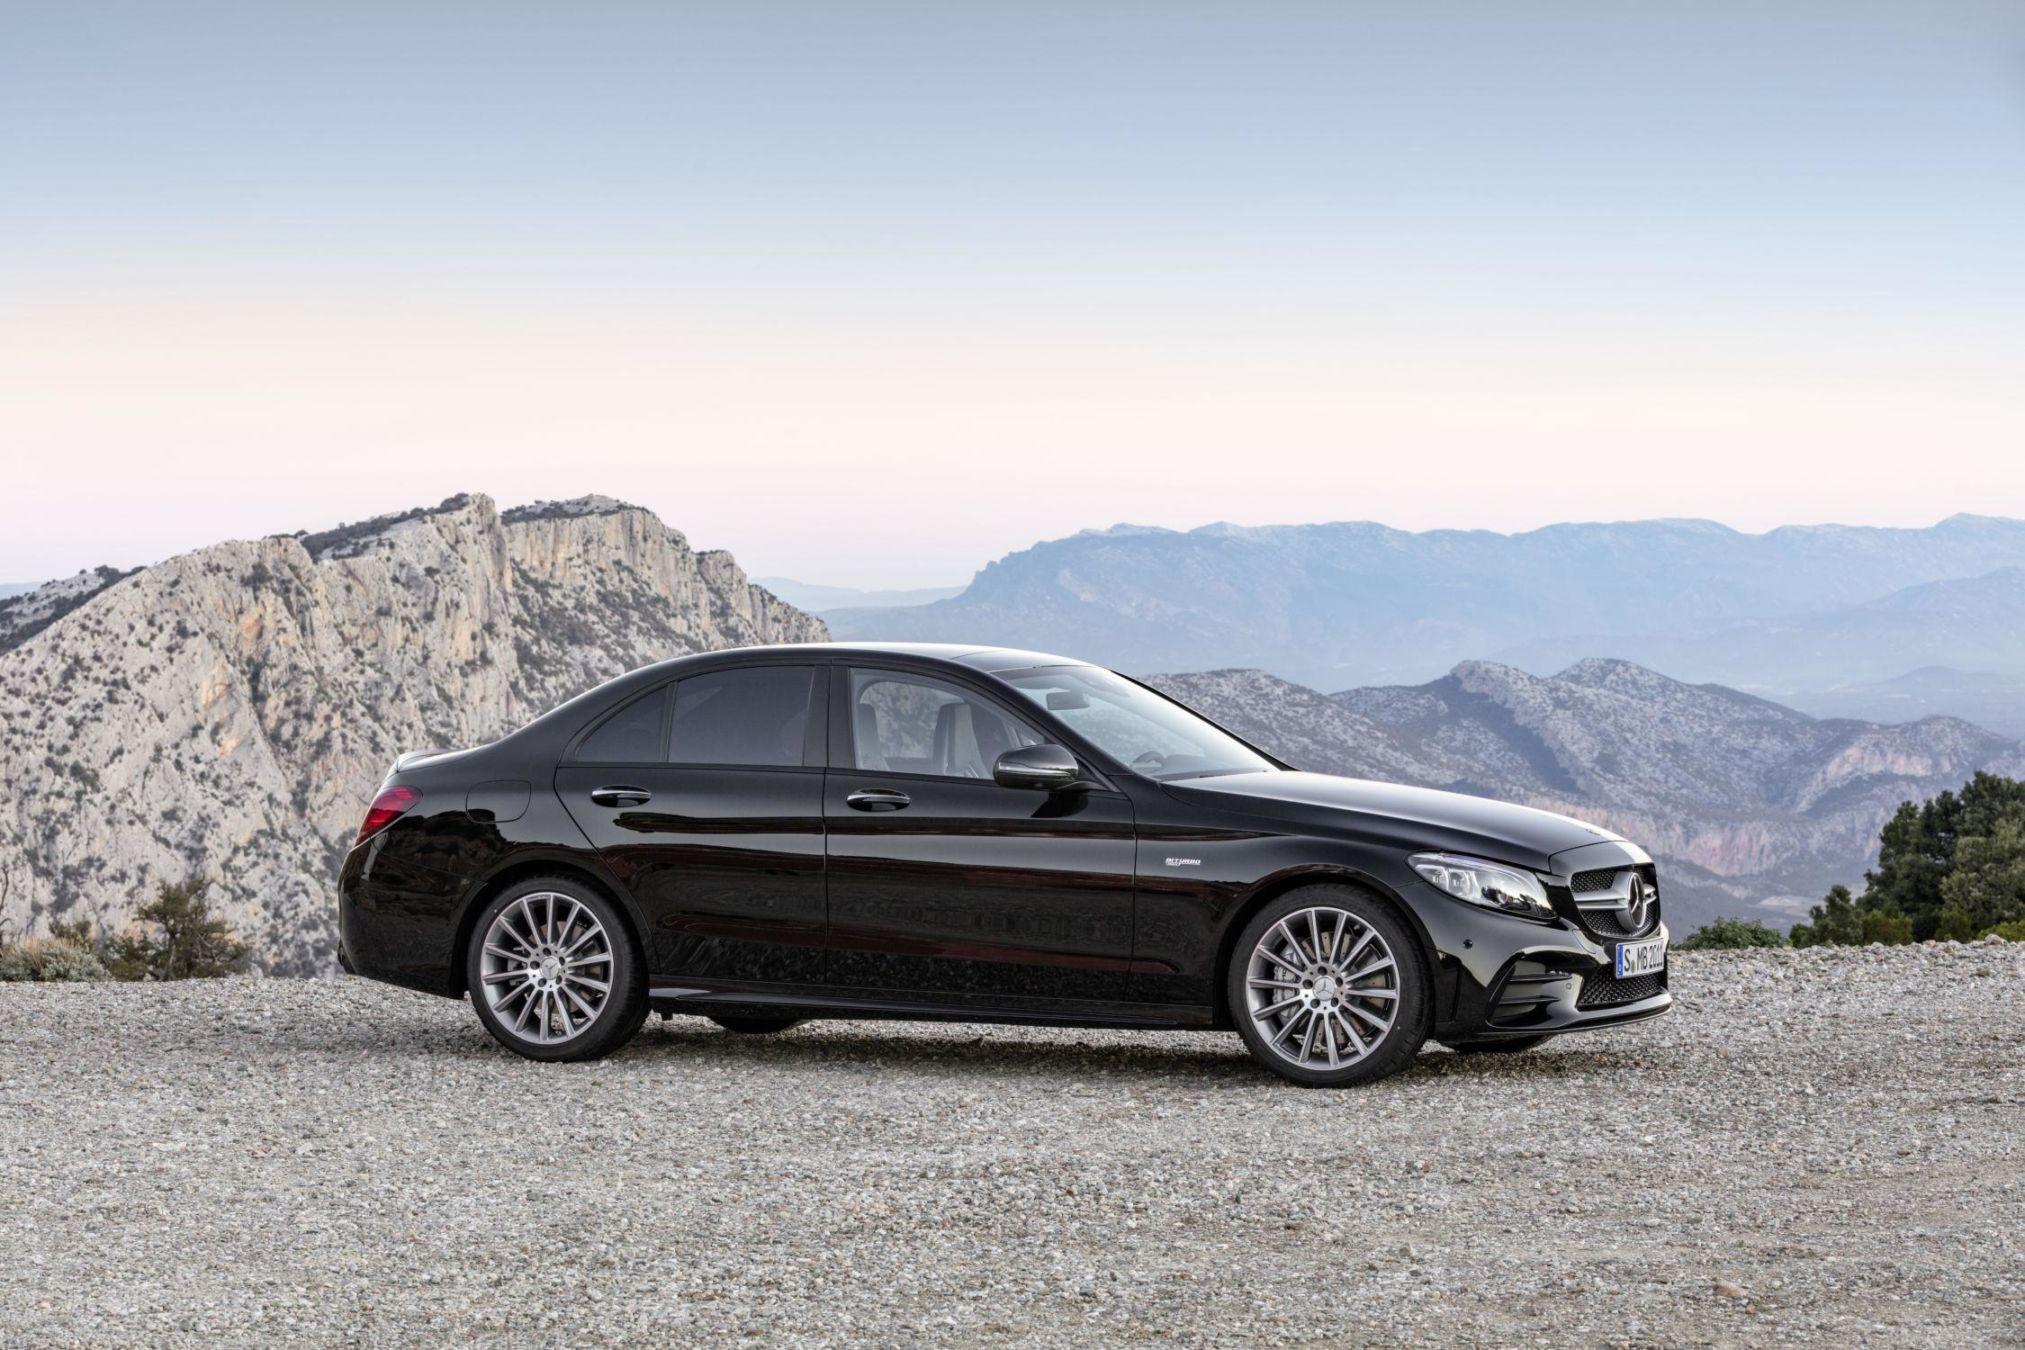 Mercedes-AMG GT 4 Door Coupé : L'ultime teaser